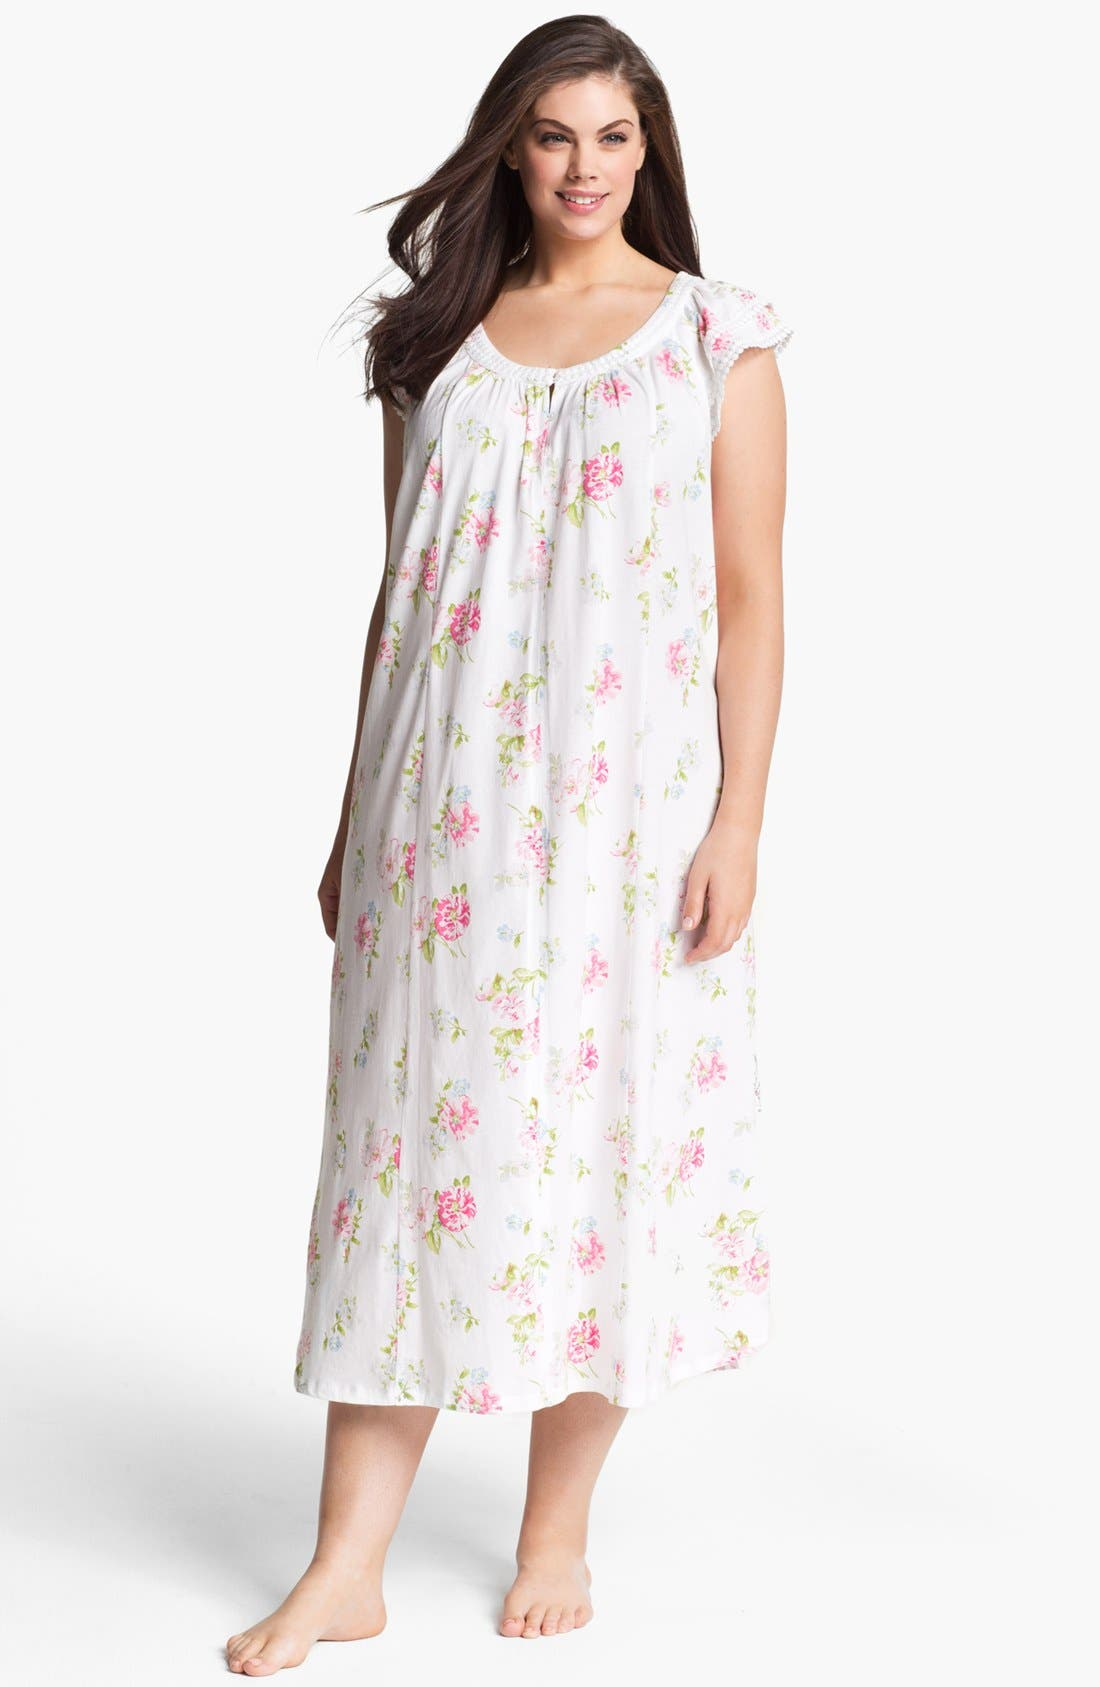 Main Image - Carole Hochman Designs Cap Sleeve Nightgown (Plus Size)